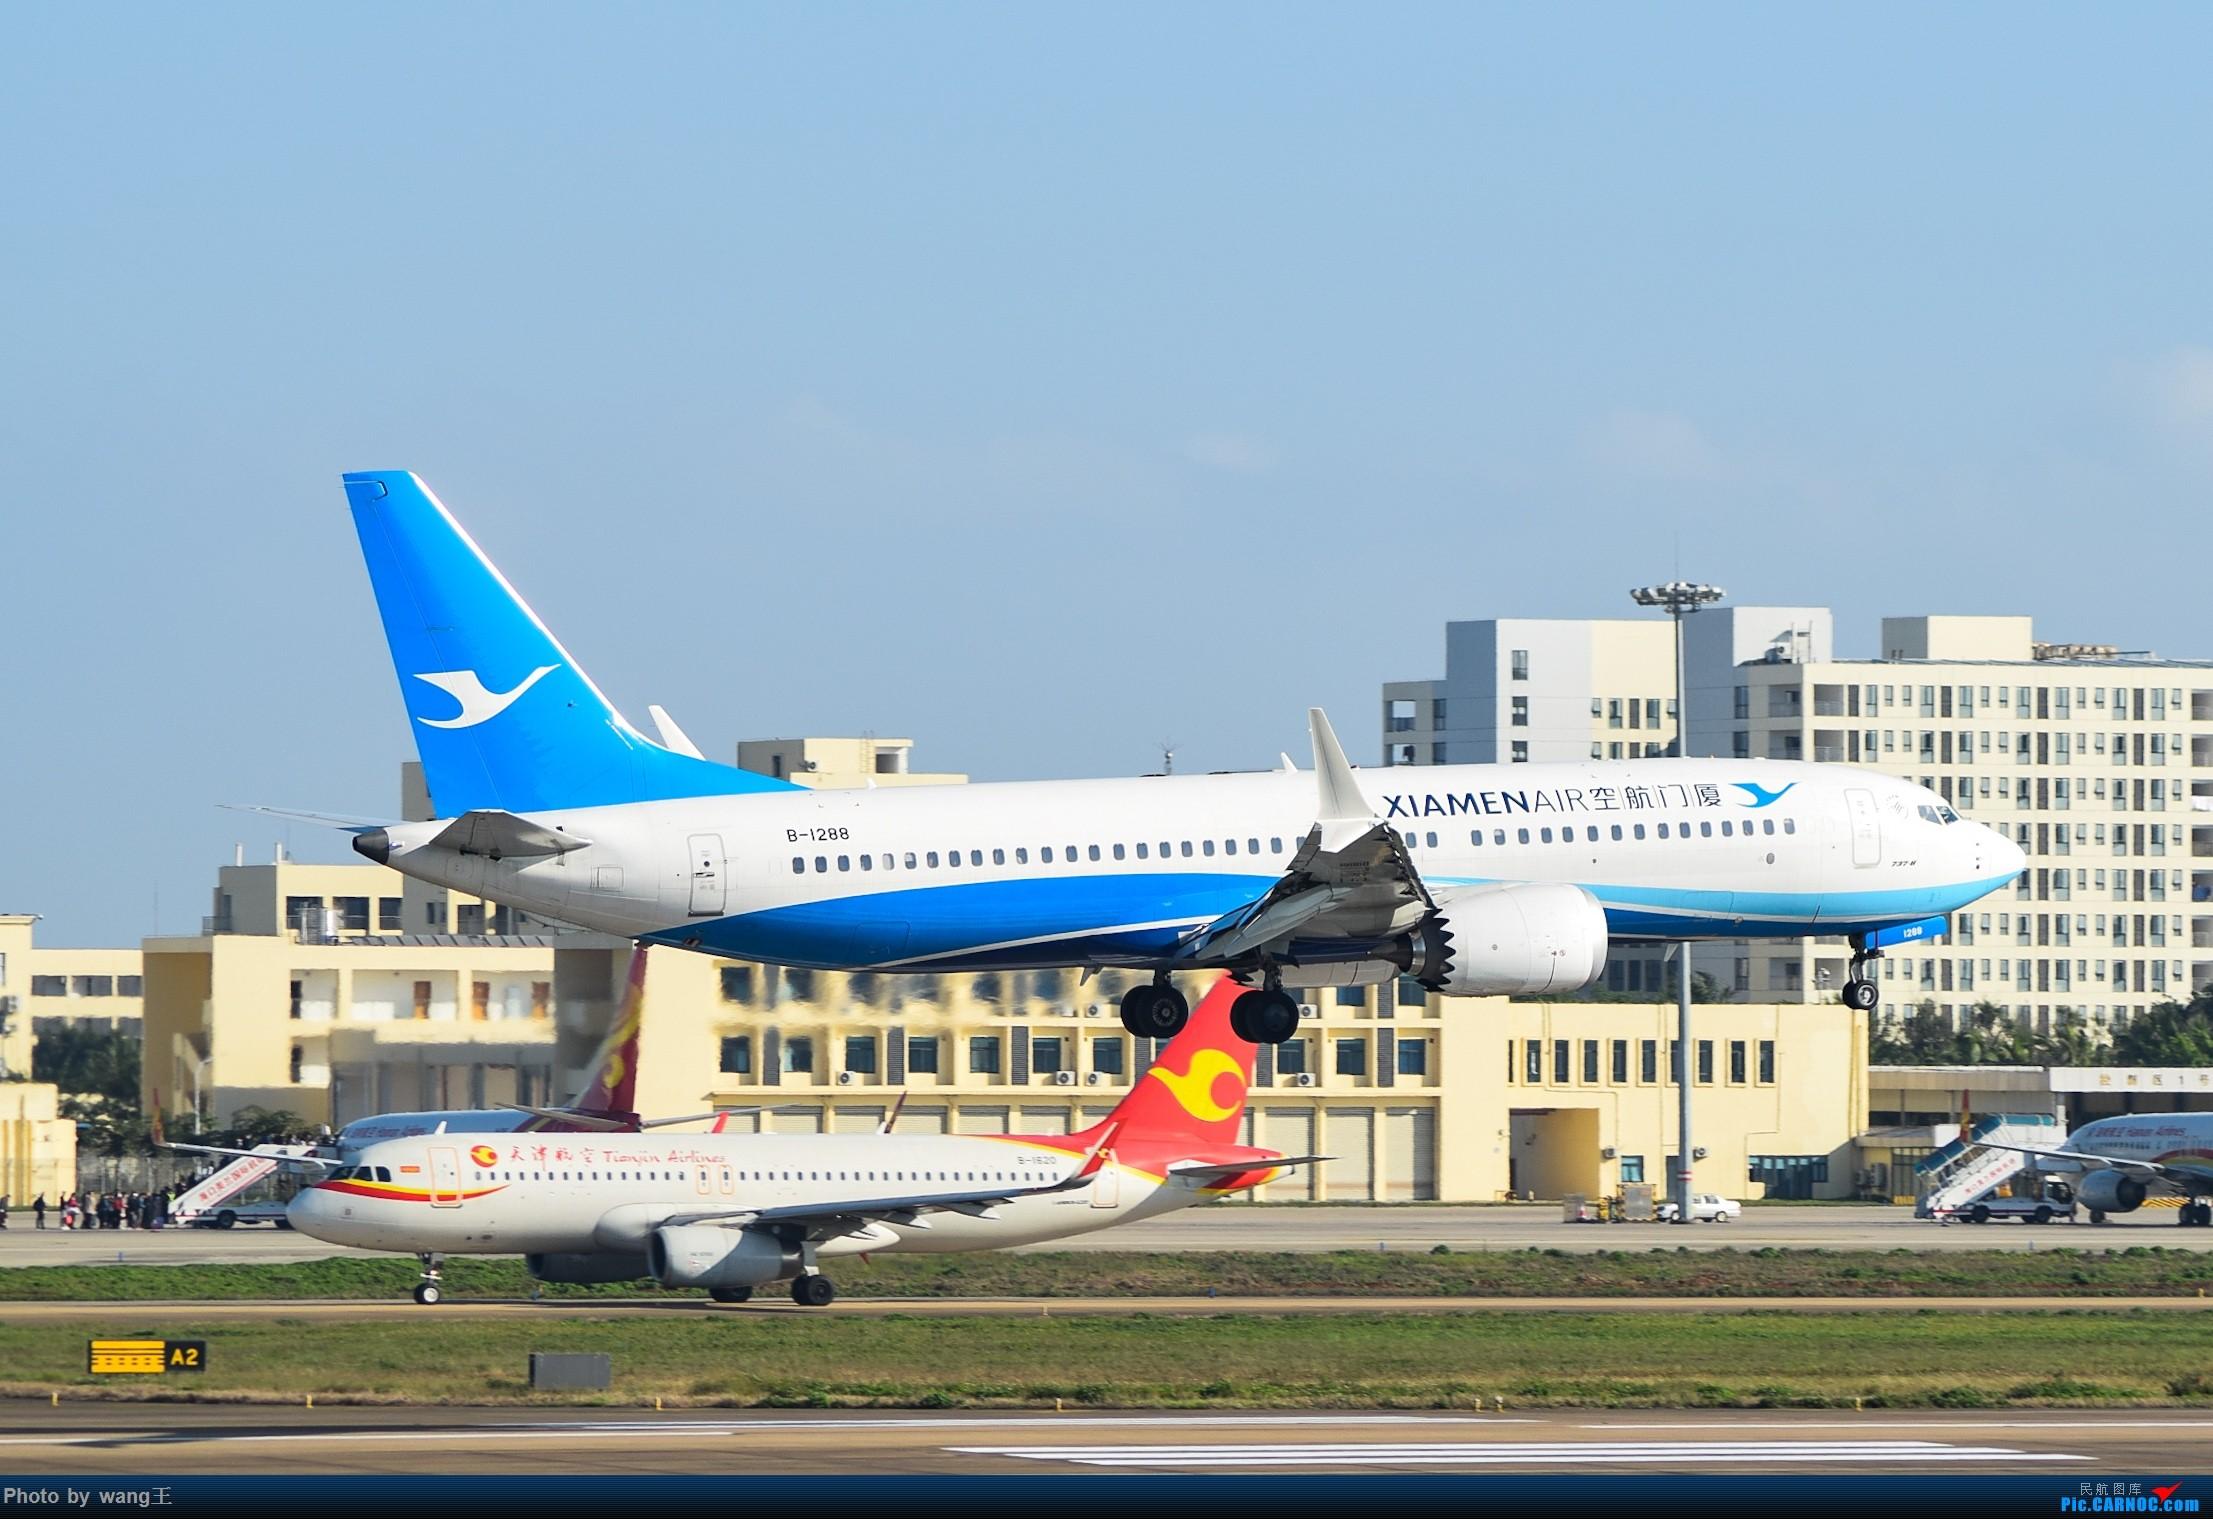 Re:[原创]记录HAK 2019的春运 BOEING 737MAX-8 B-1288 中国海口美兰国际机场